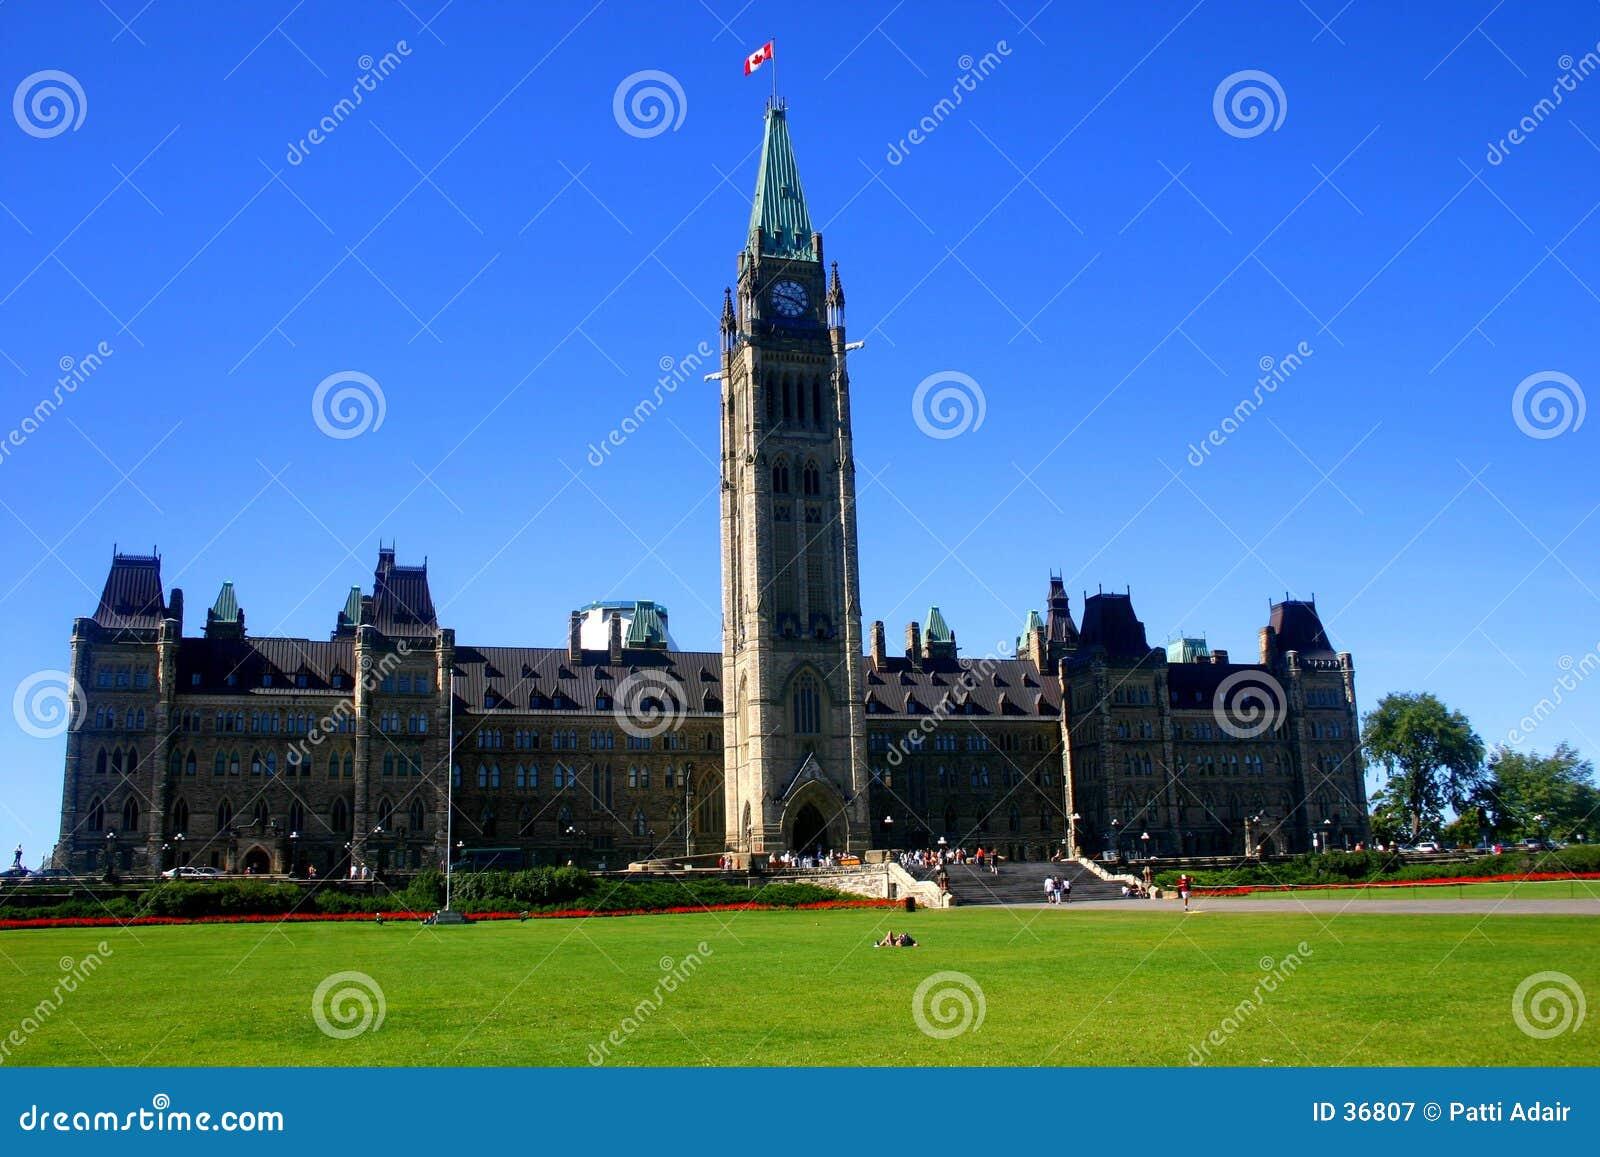 Kanada parlament s